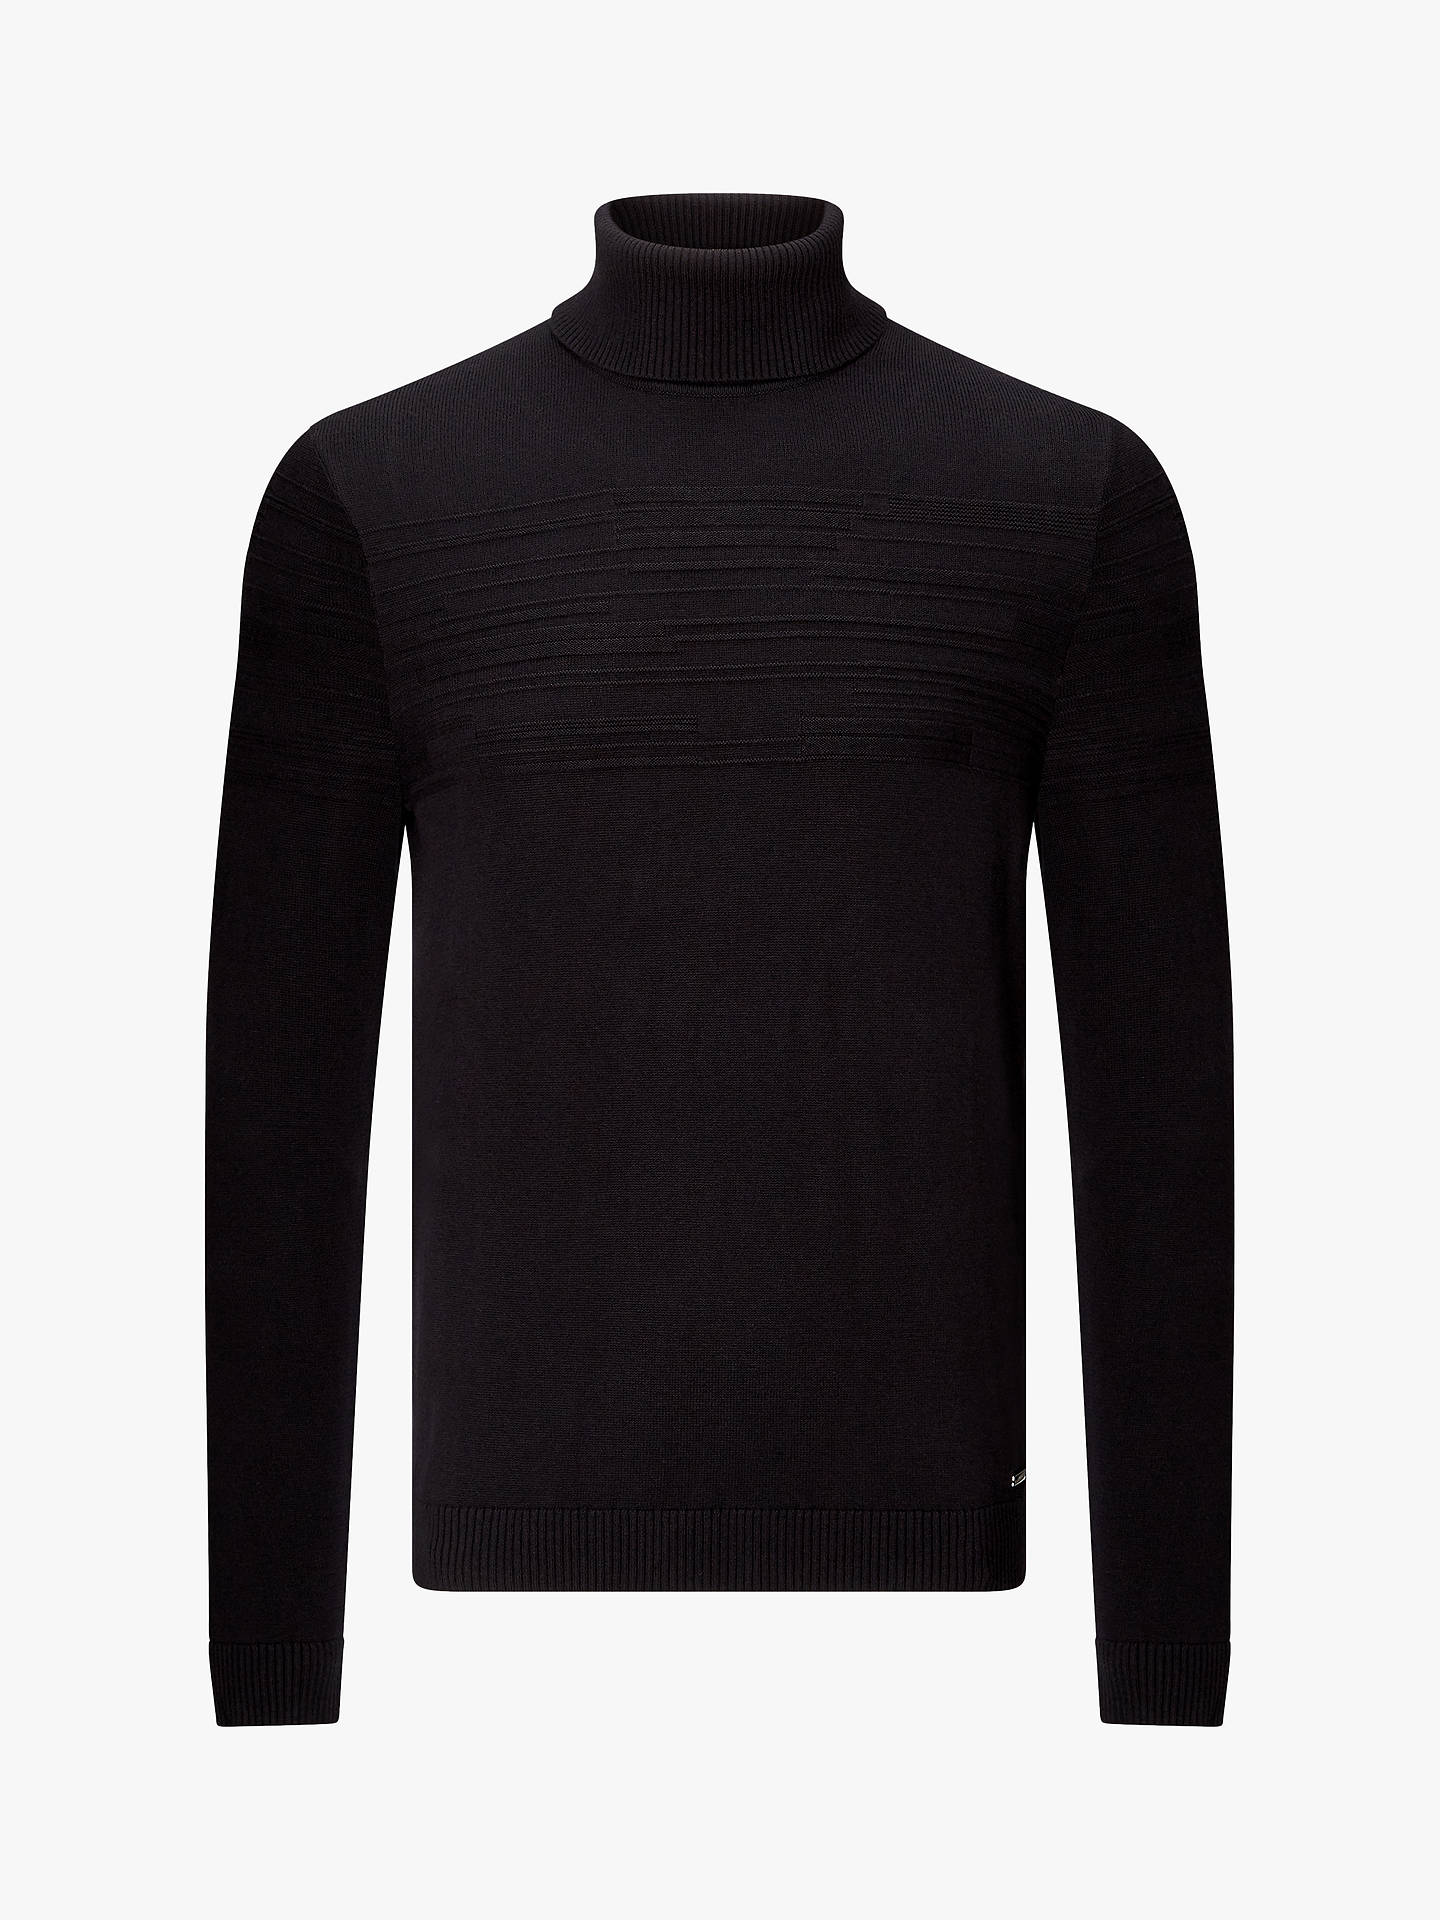 68339914ea2 HUGO by Hugo Boss Sisealon Wool Cotton Roll Neck Jumper, Black at ...